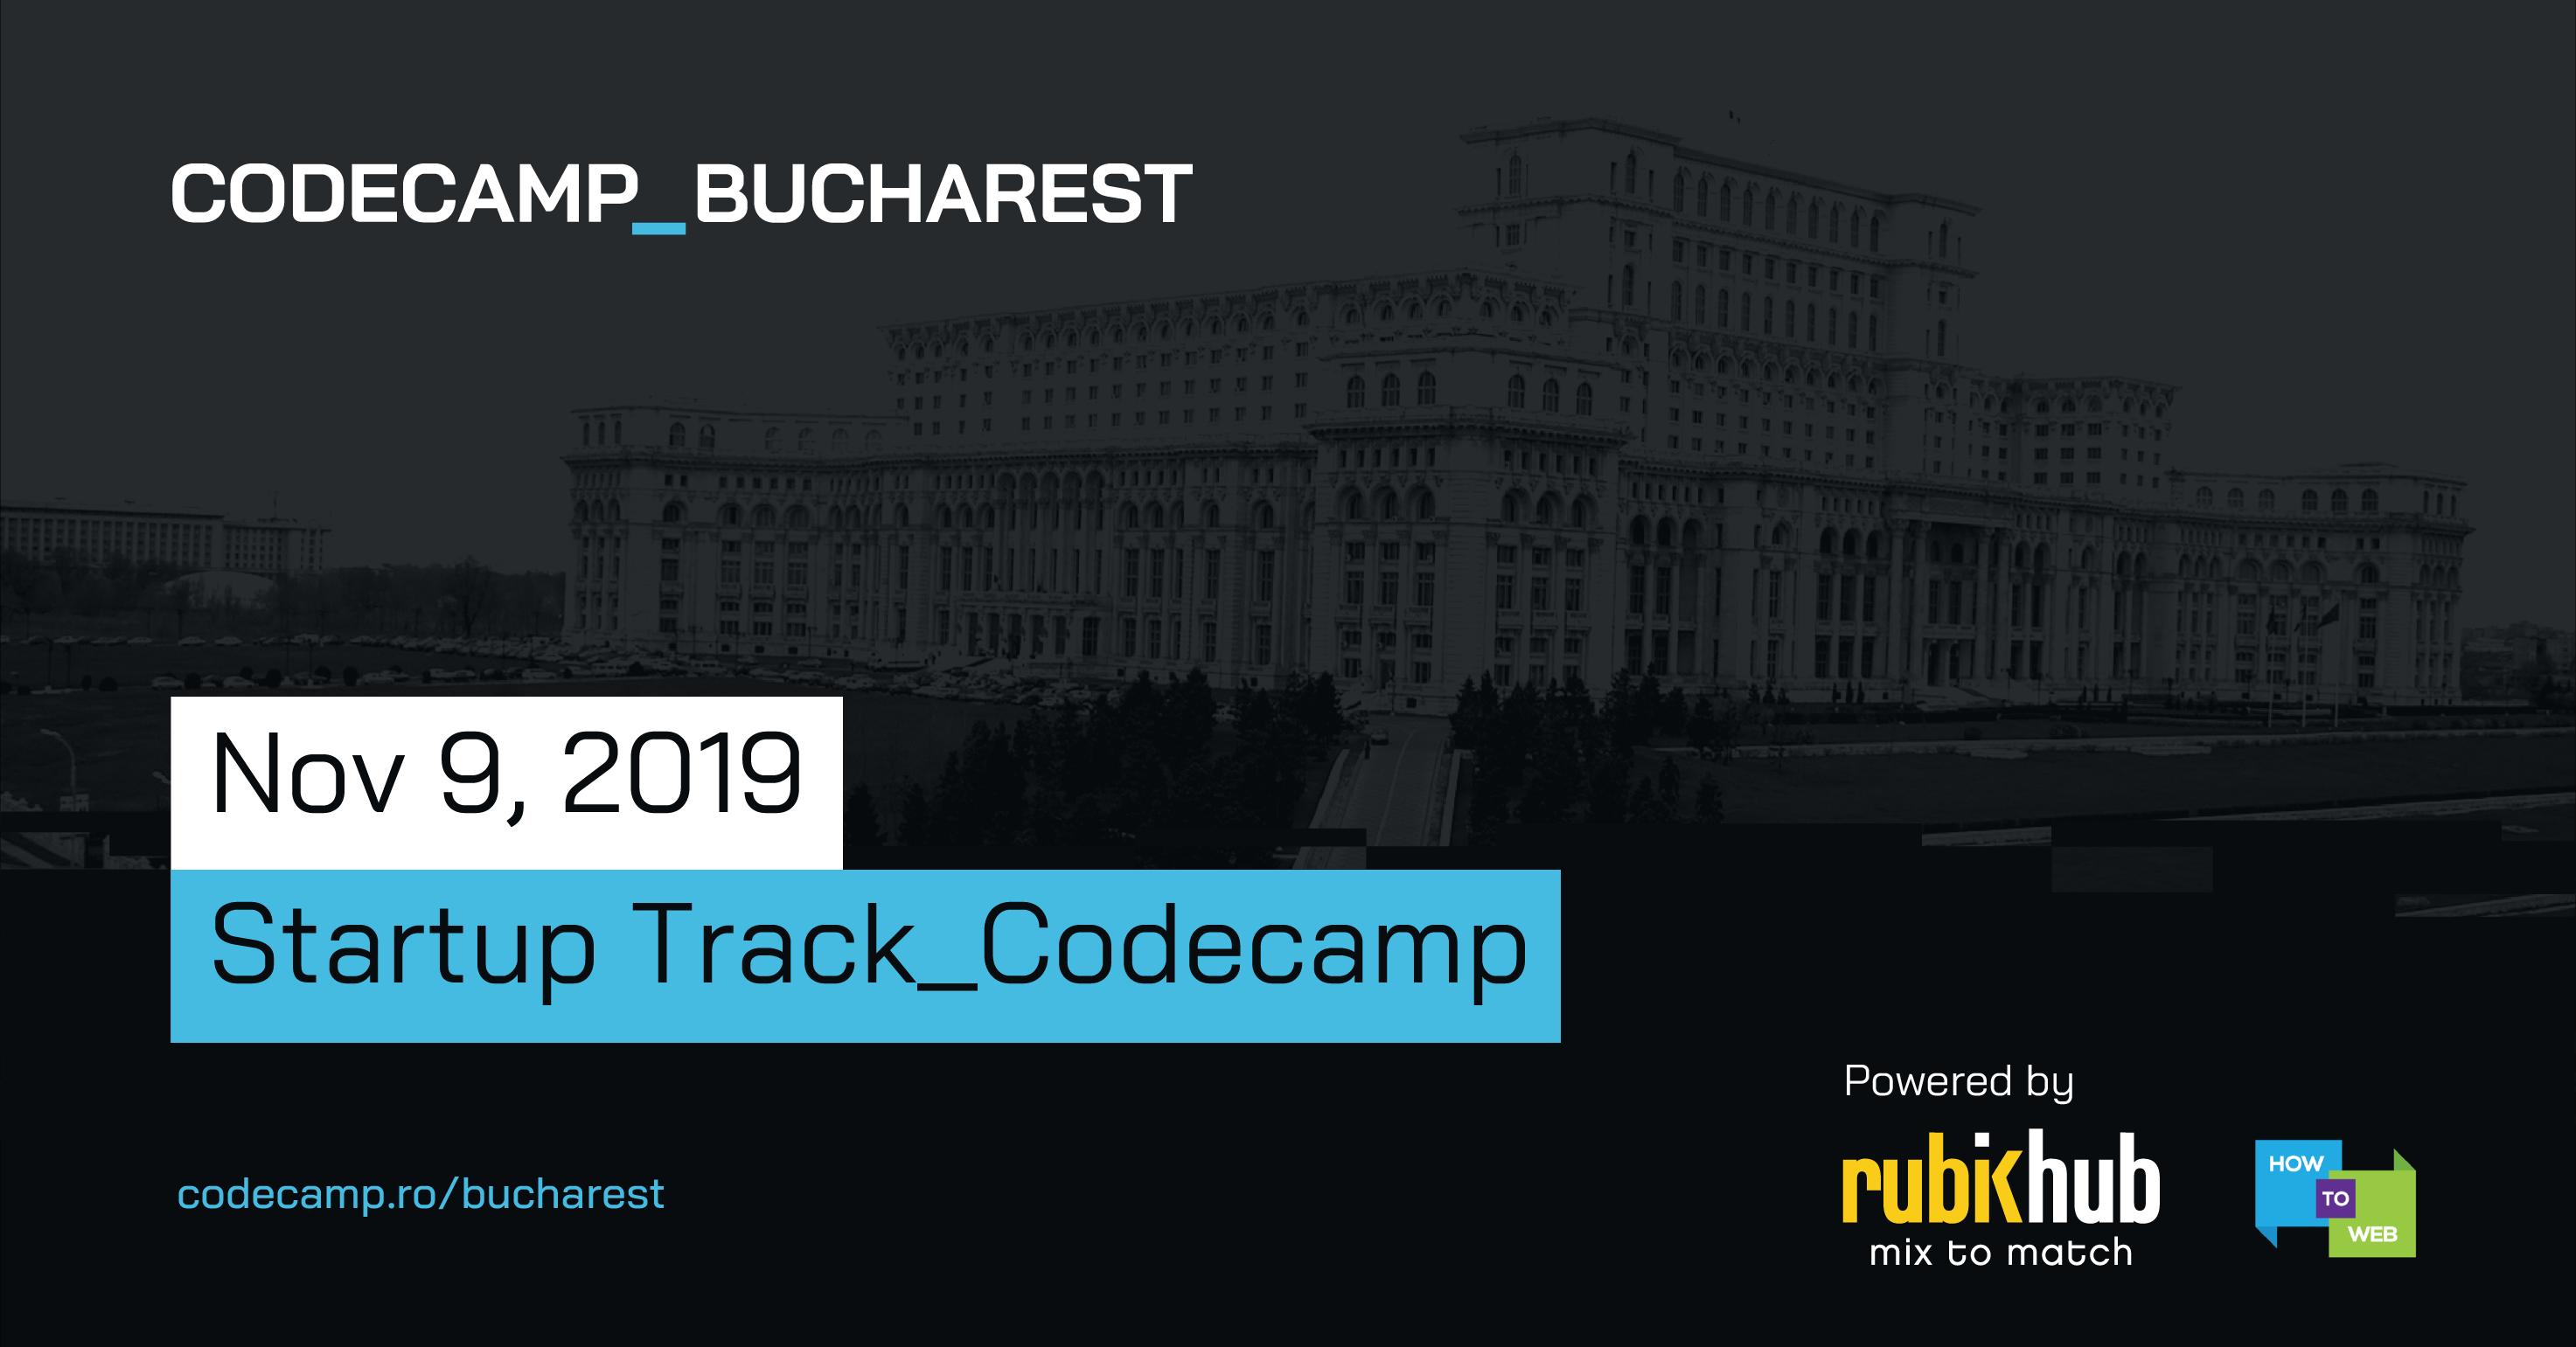 Codecamp Bucharest nov 2019